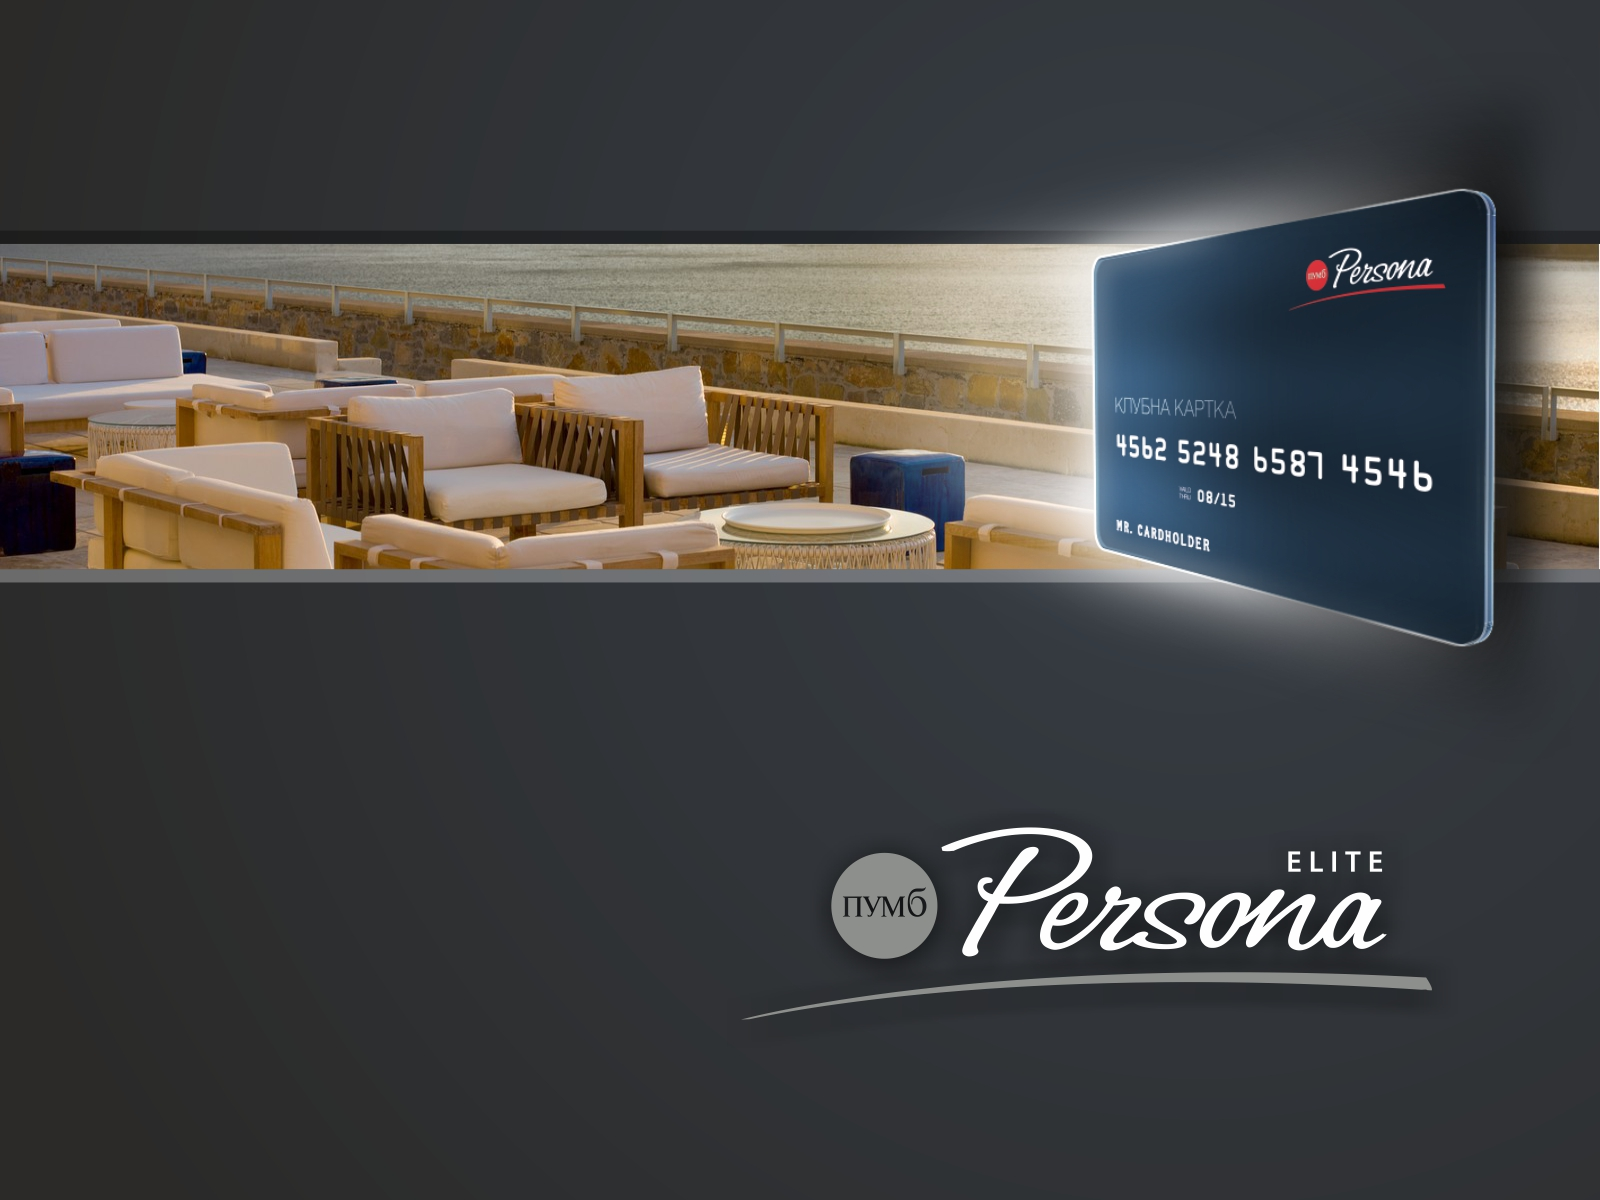 persona-elit-1-last